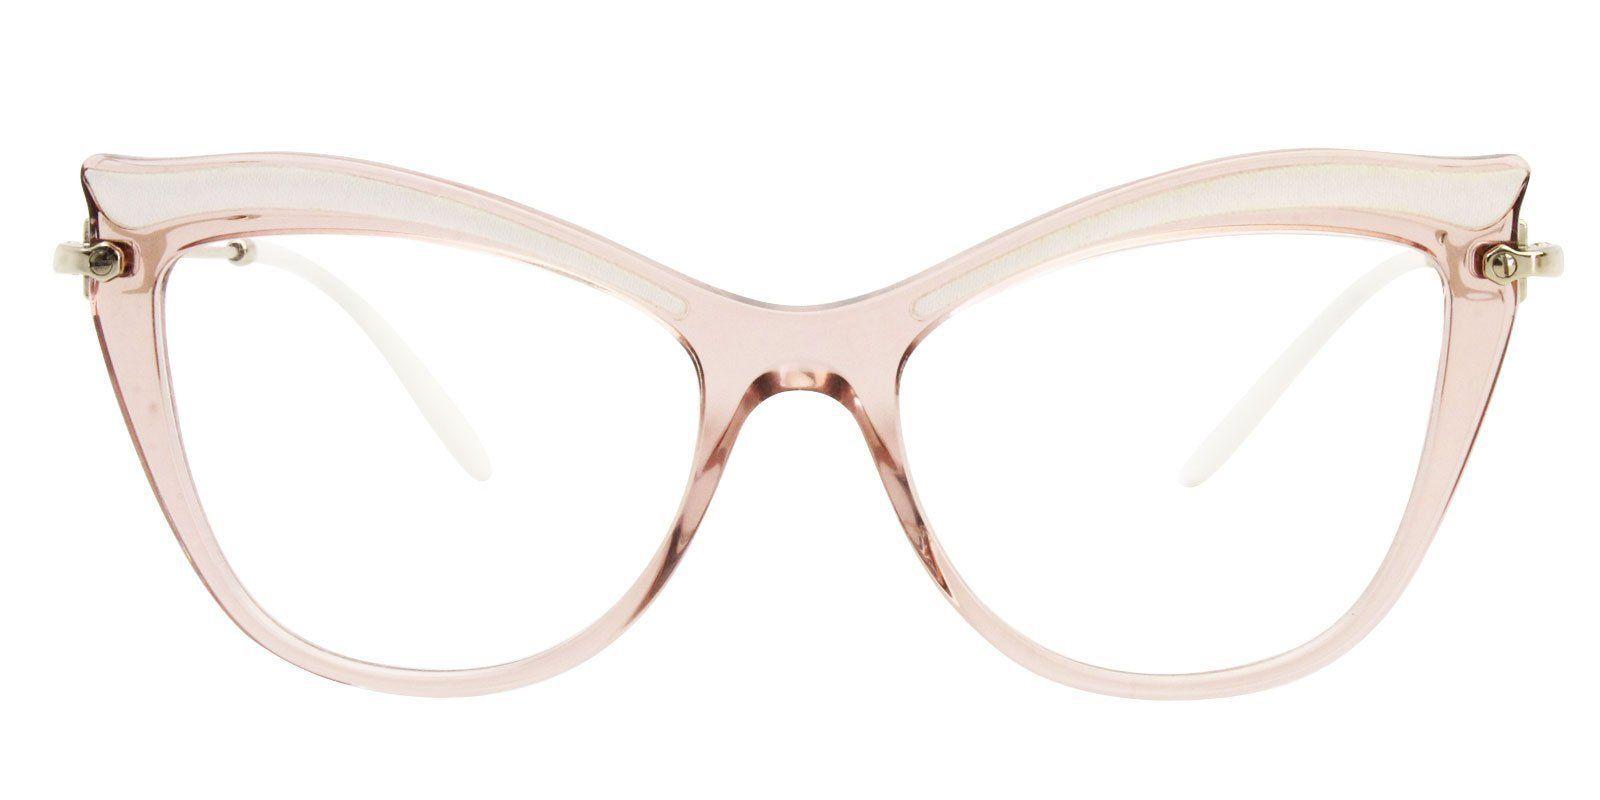 41f516d35fe Miu Miu - MU06PV Pink Eyeglasses in 2019